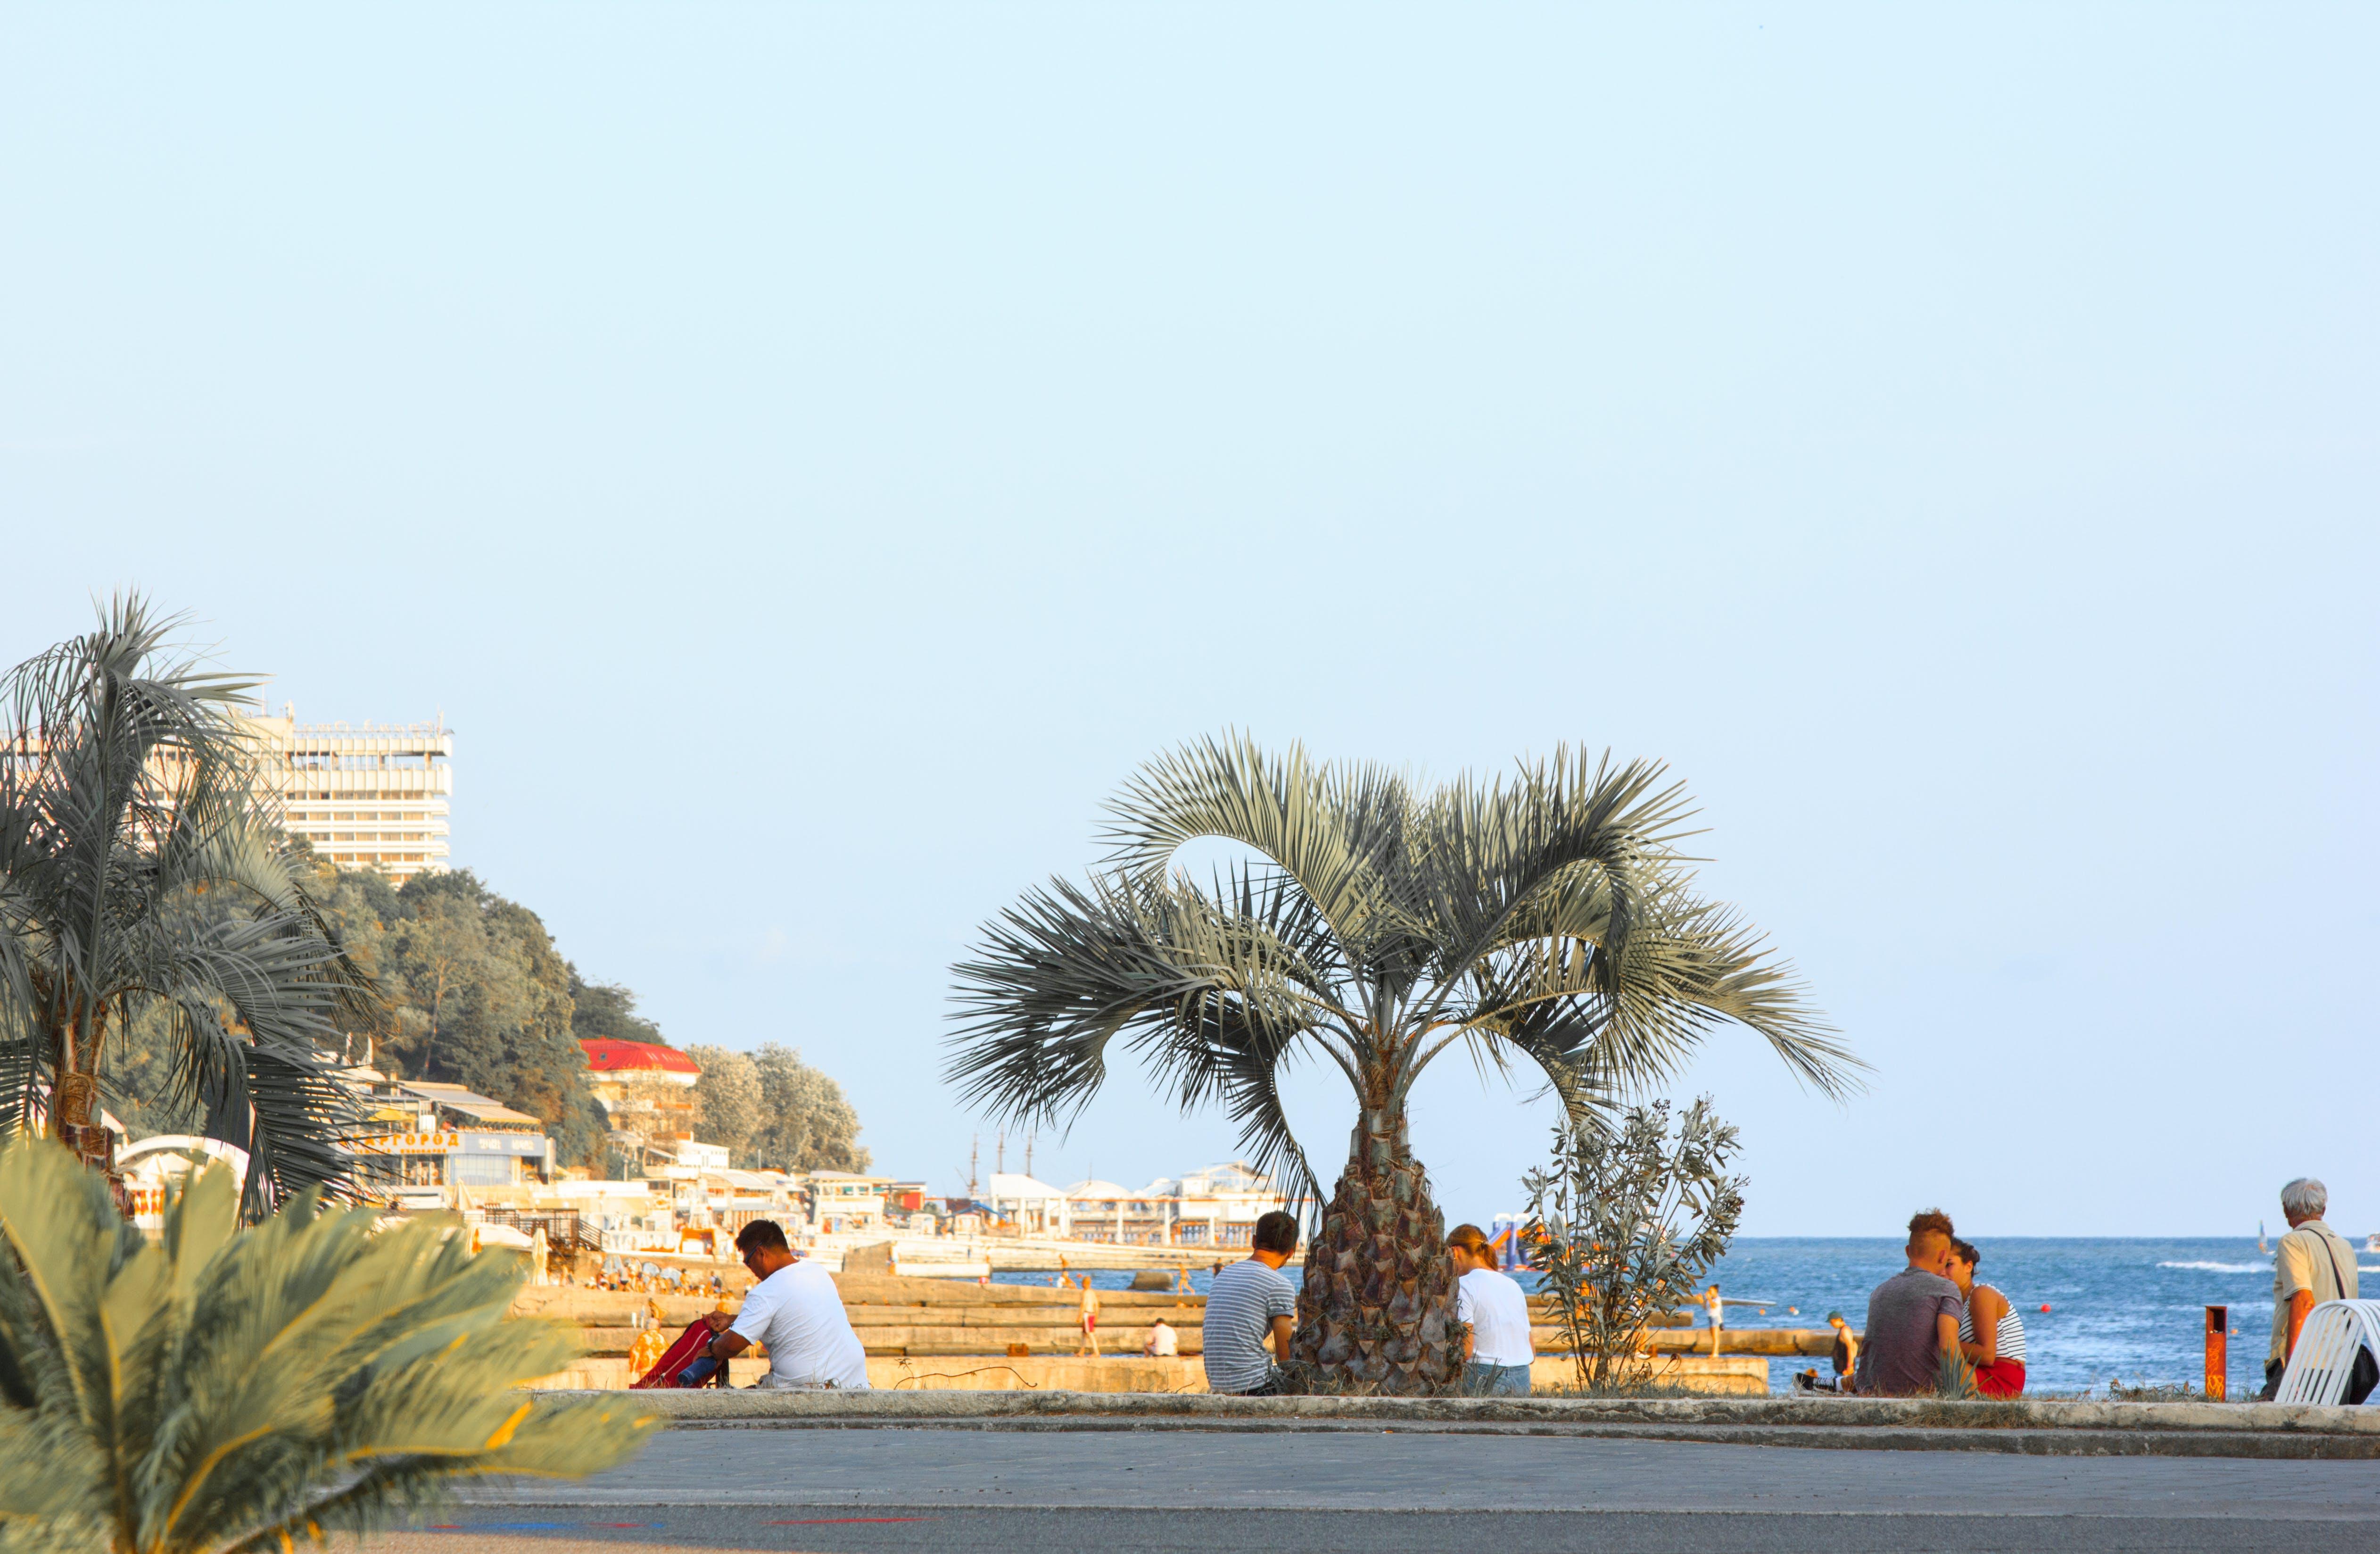 Free stock photo of sea, beach, bay, sun